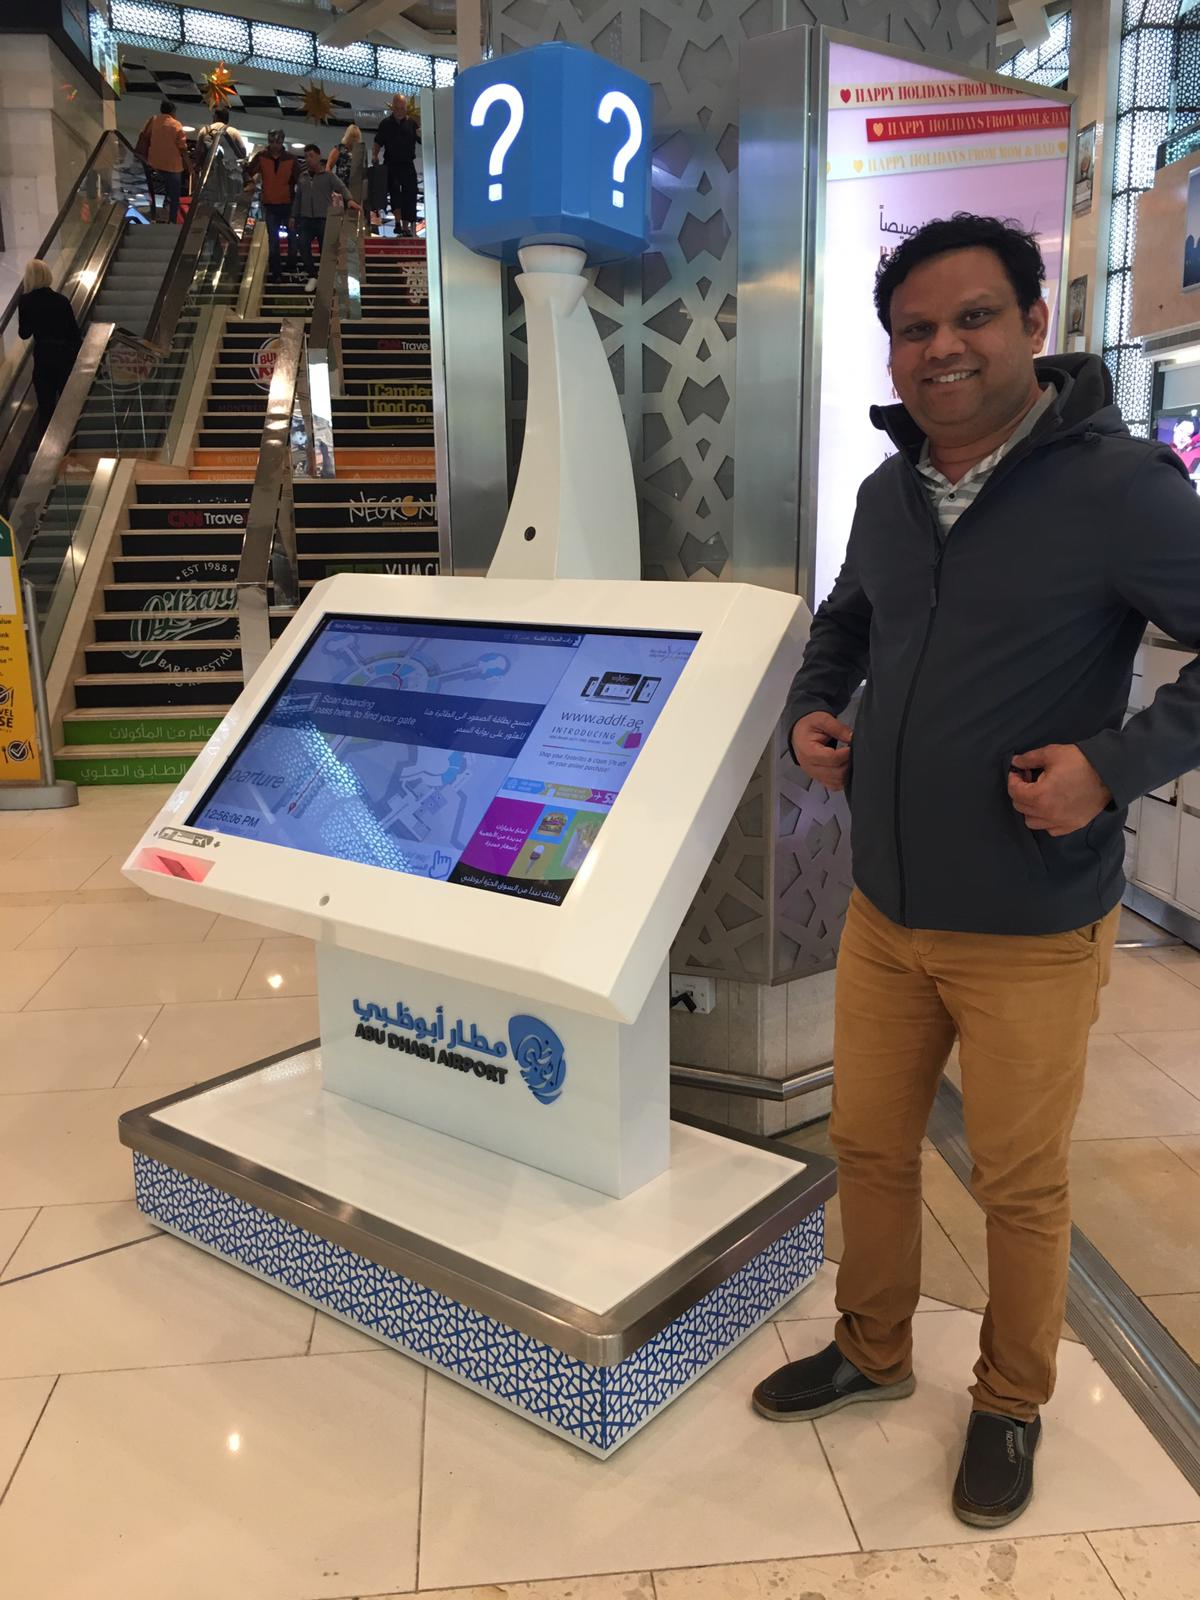 Abu-Dhabi-Airport-Information-Kiosk-With-Sayee